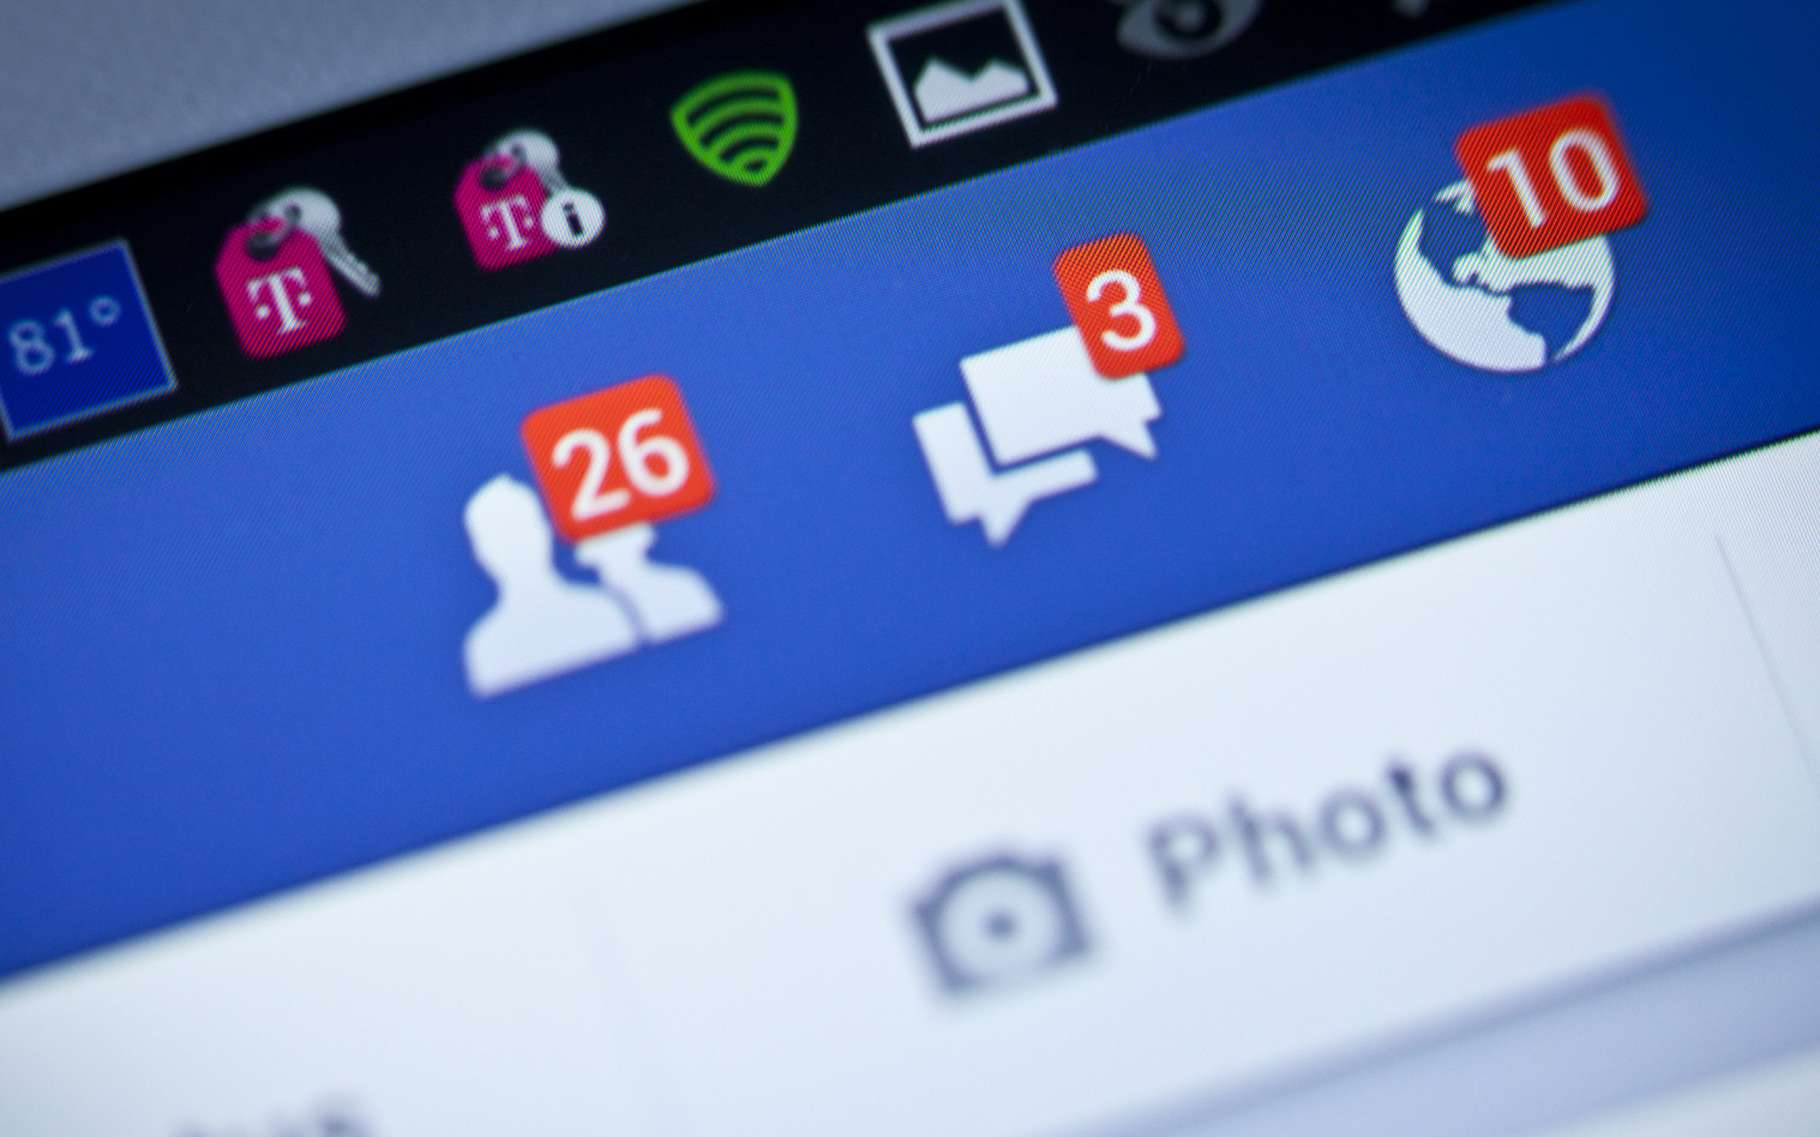 Comment Zuckerberg veut redorer l'image de Facebook. © Nevodka, Shutterstock